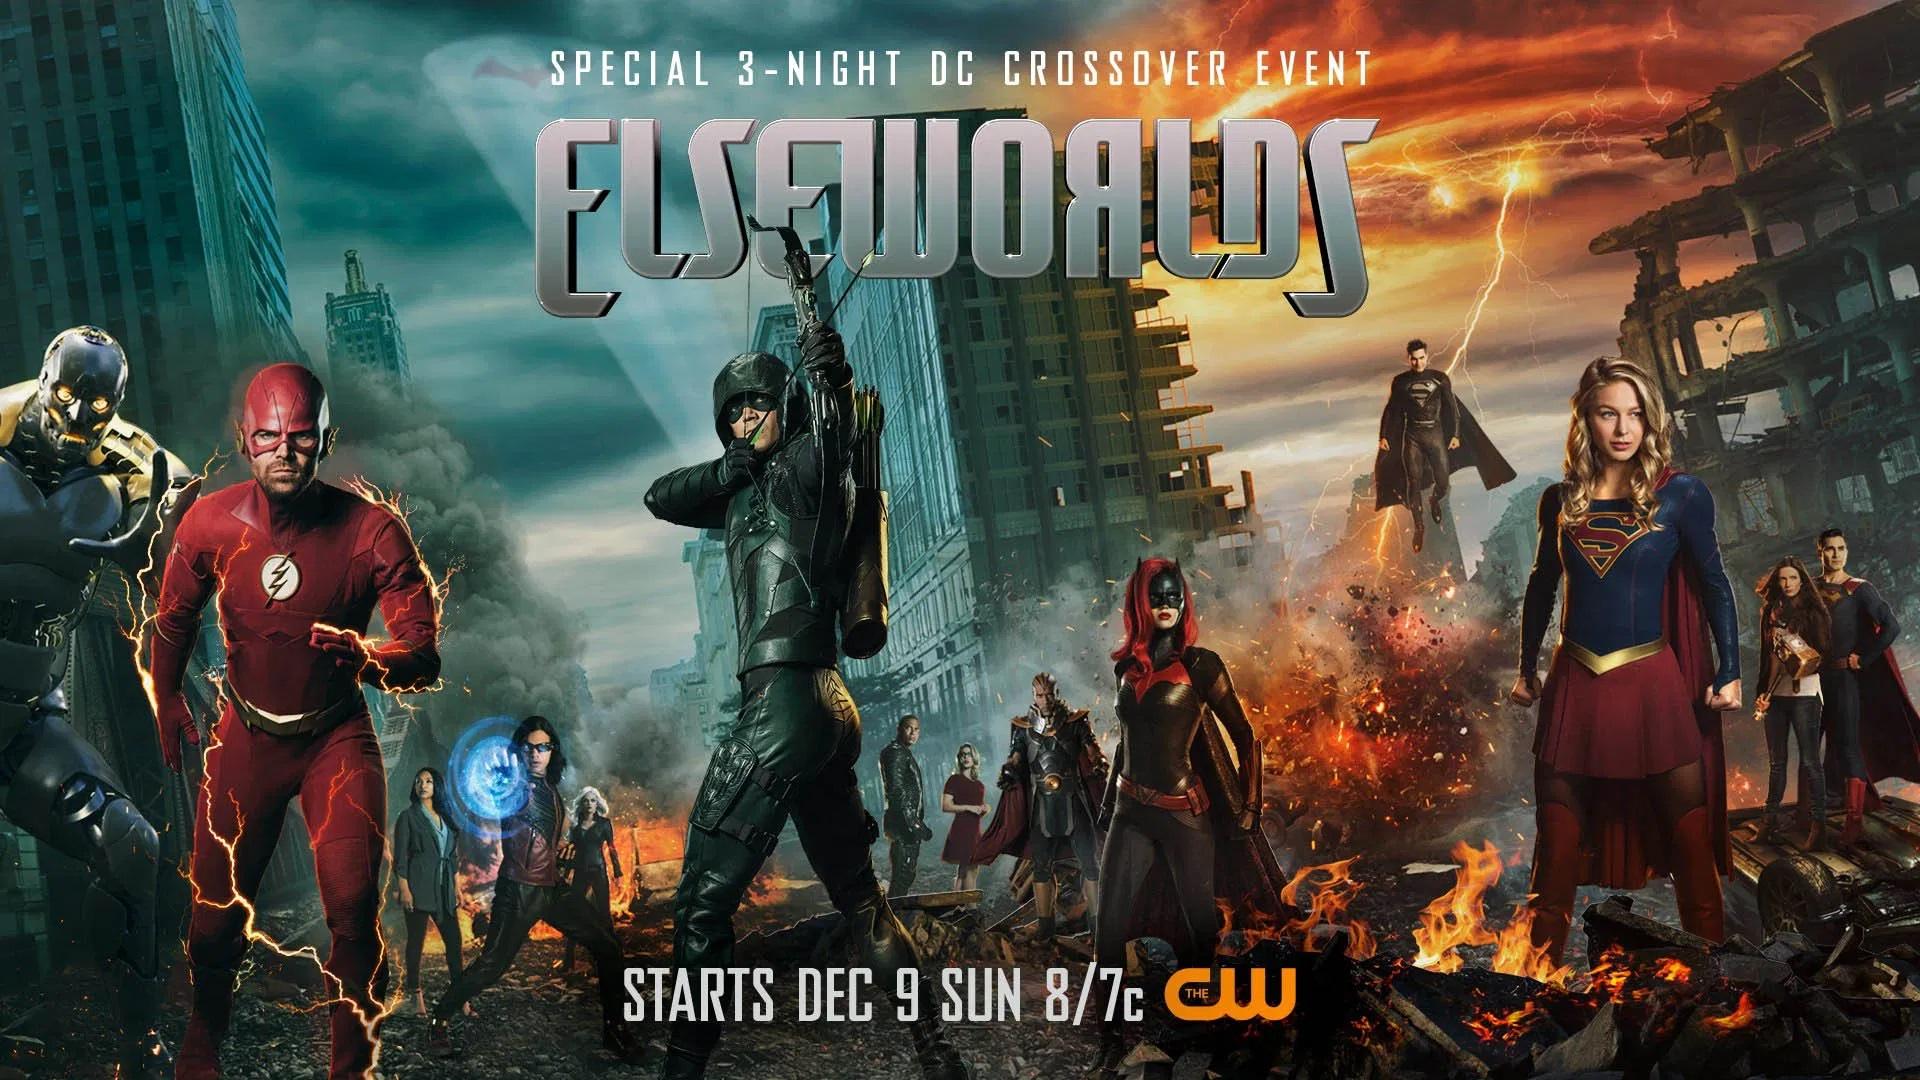 Crossover Elseworlds